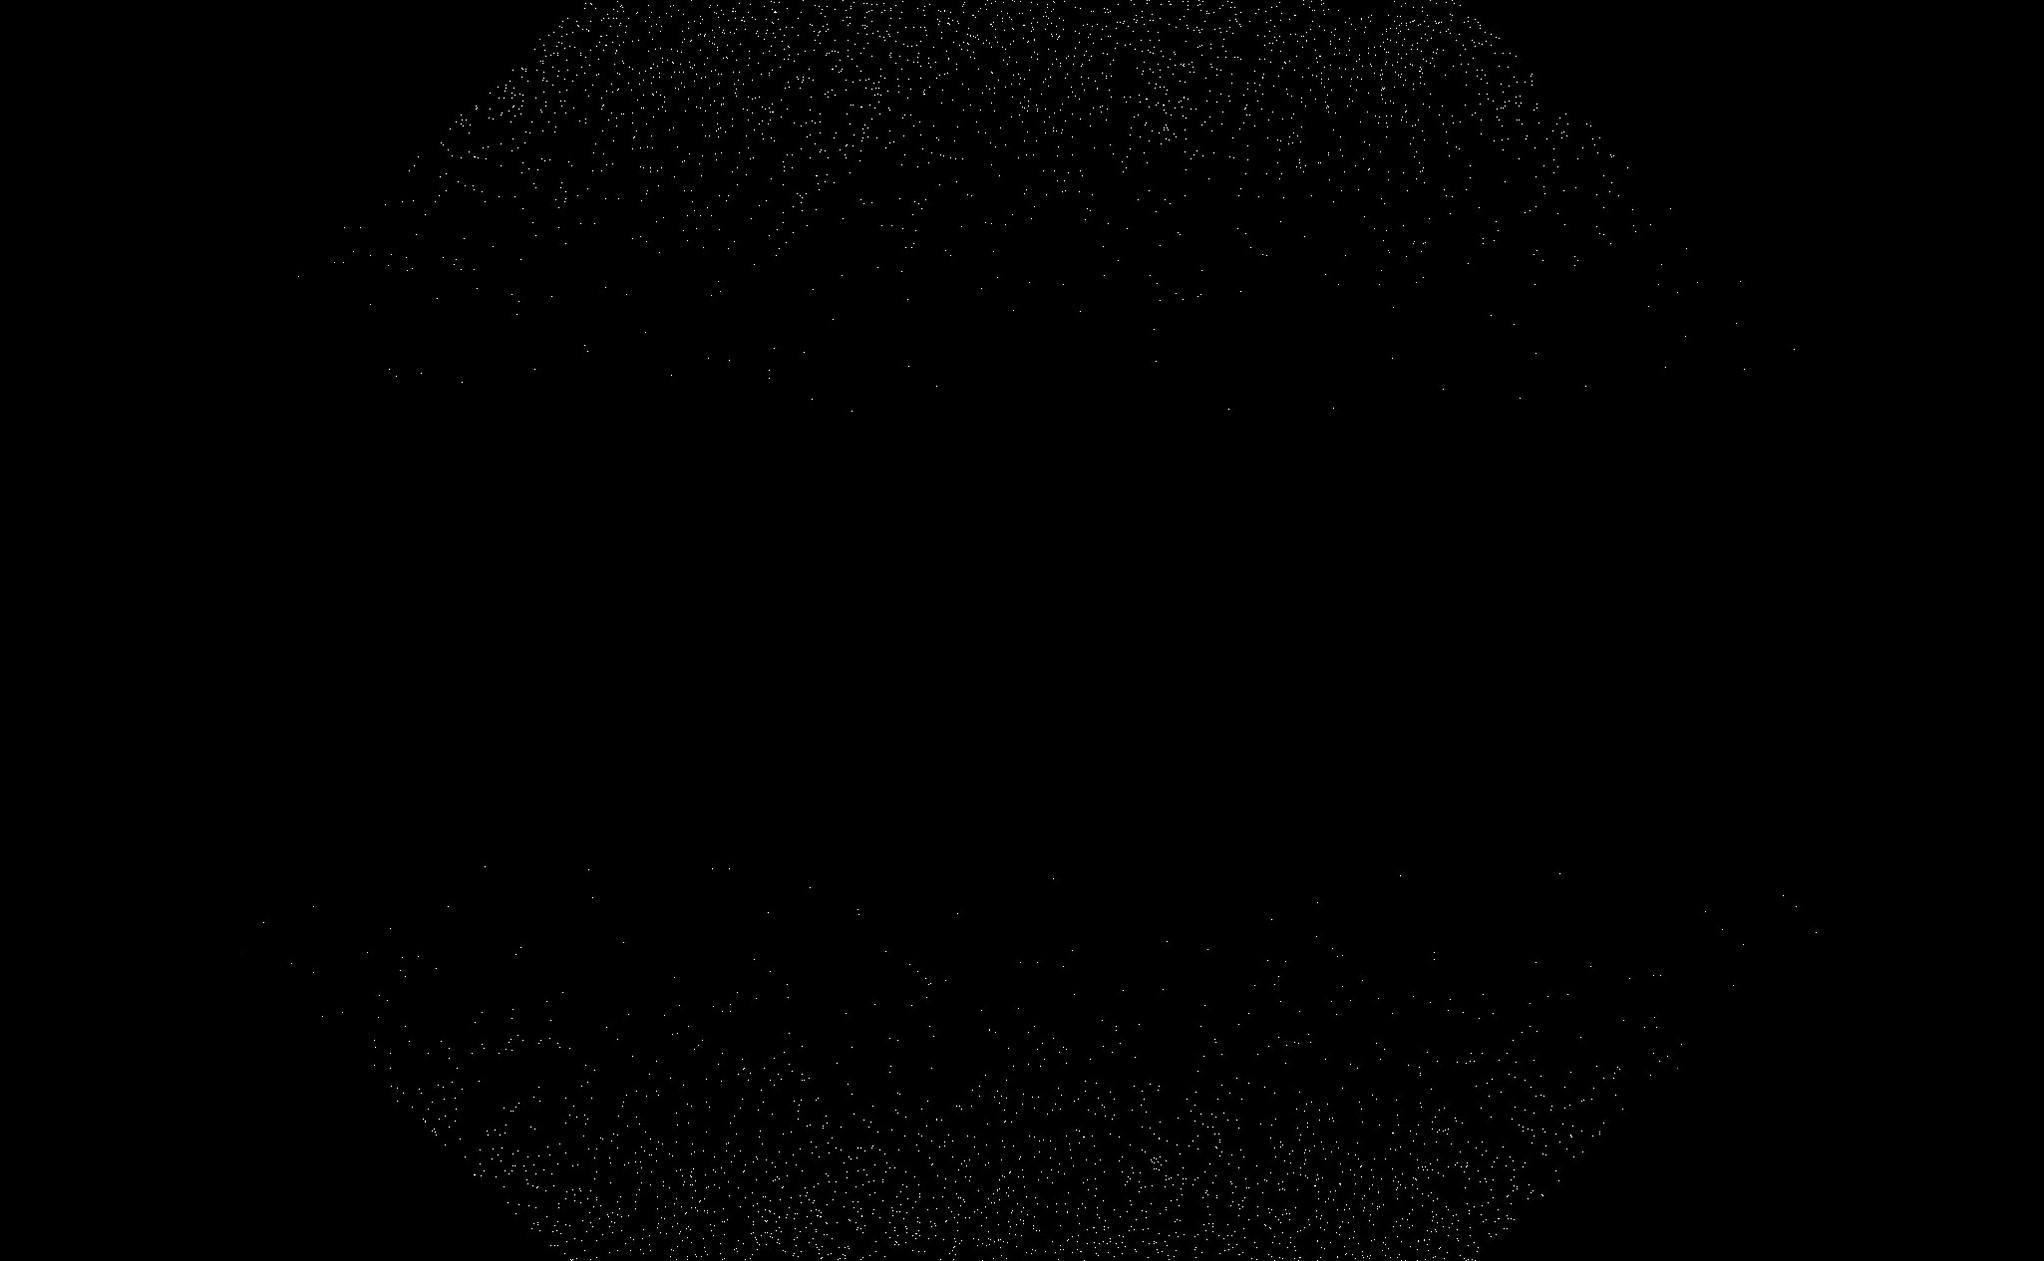 TO清修抗-SEC06-BC01=.jpg